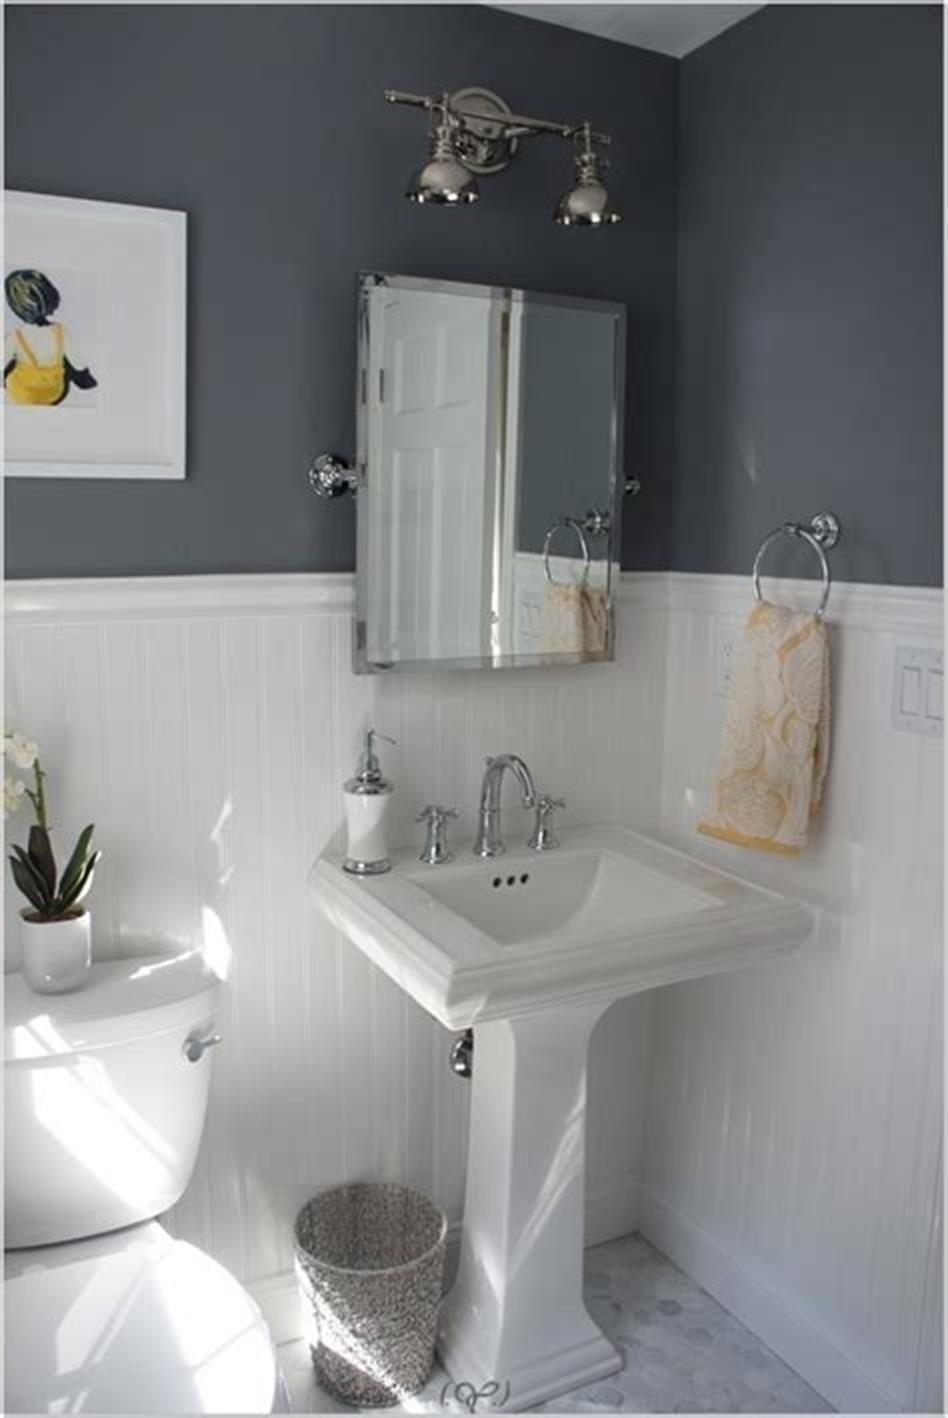 40 Most Popular Half Bathroom Decor Ideas 2019 4 in 2020 ...